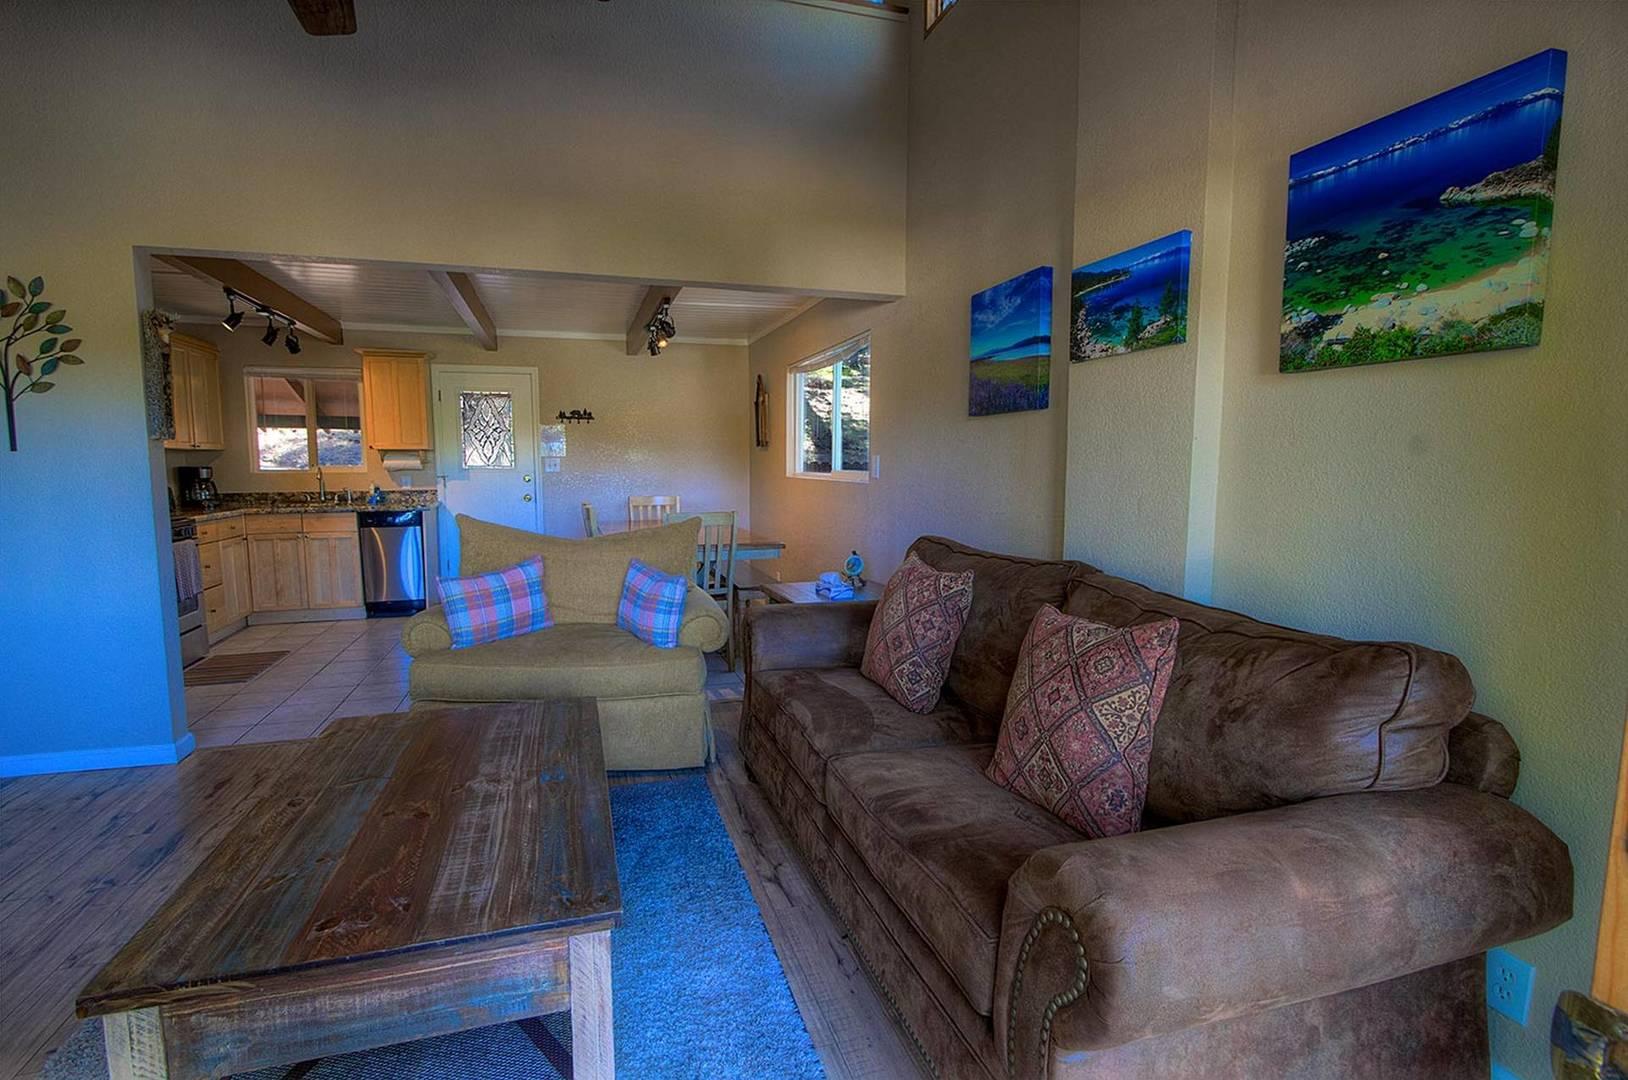 hch0900 living room